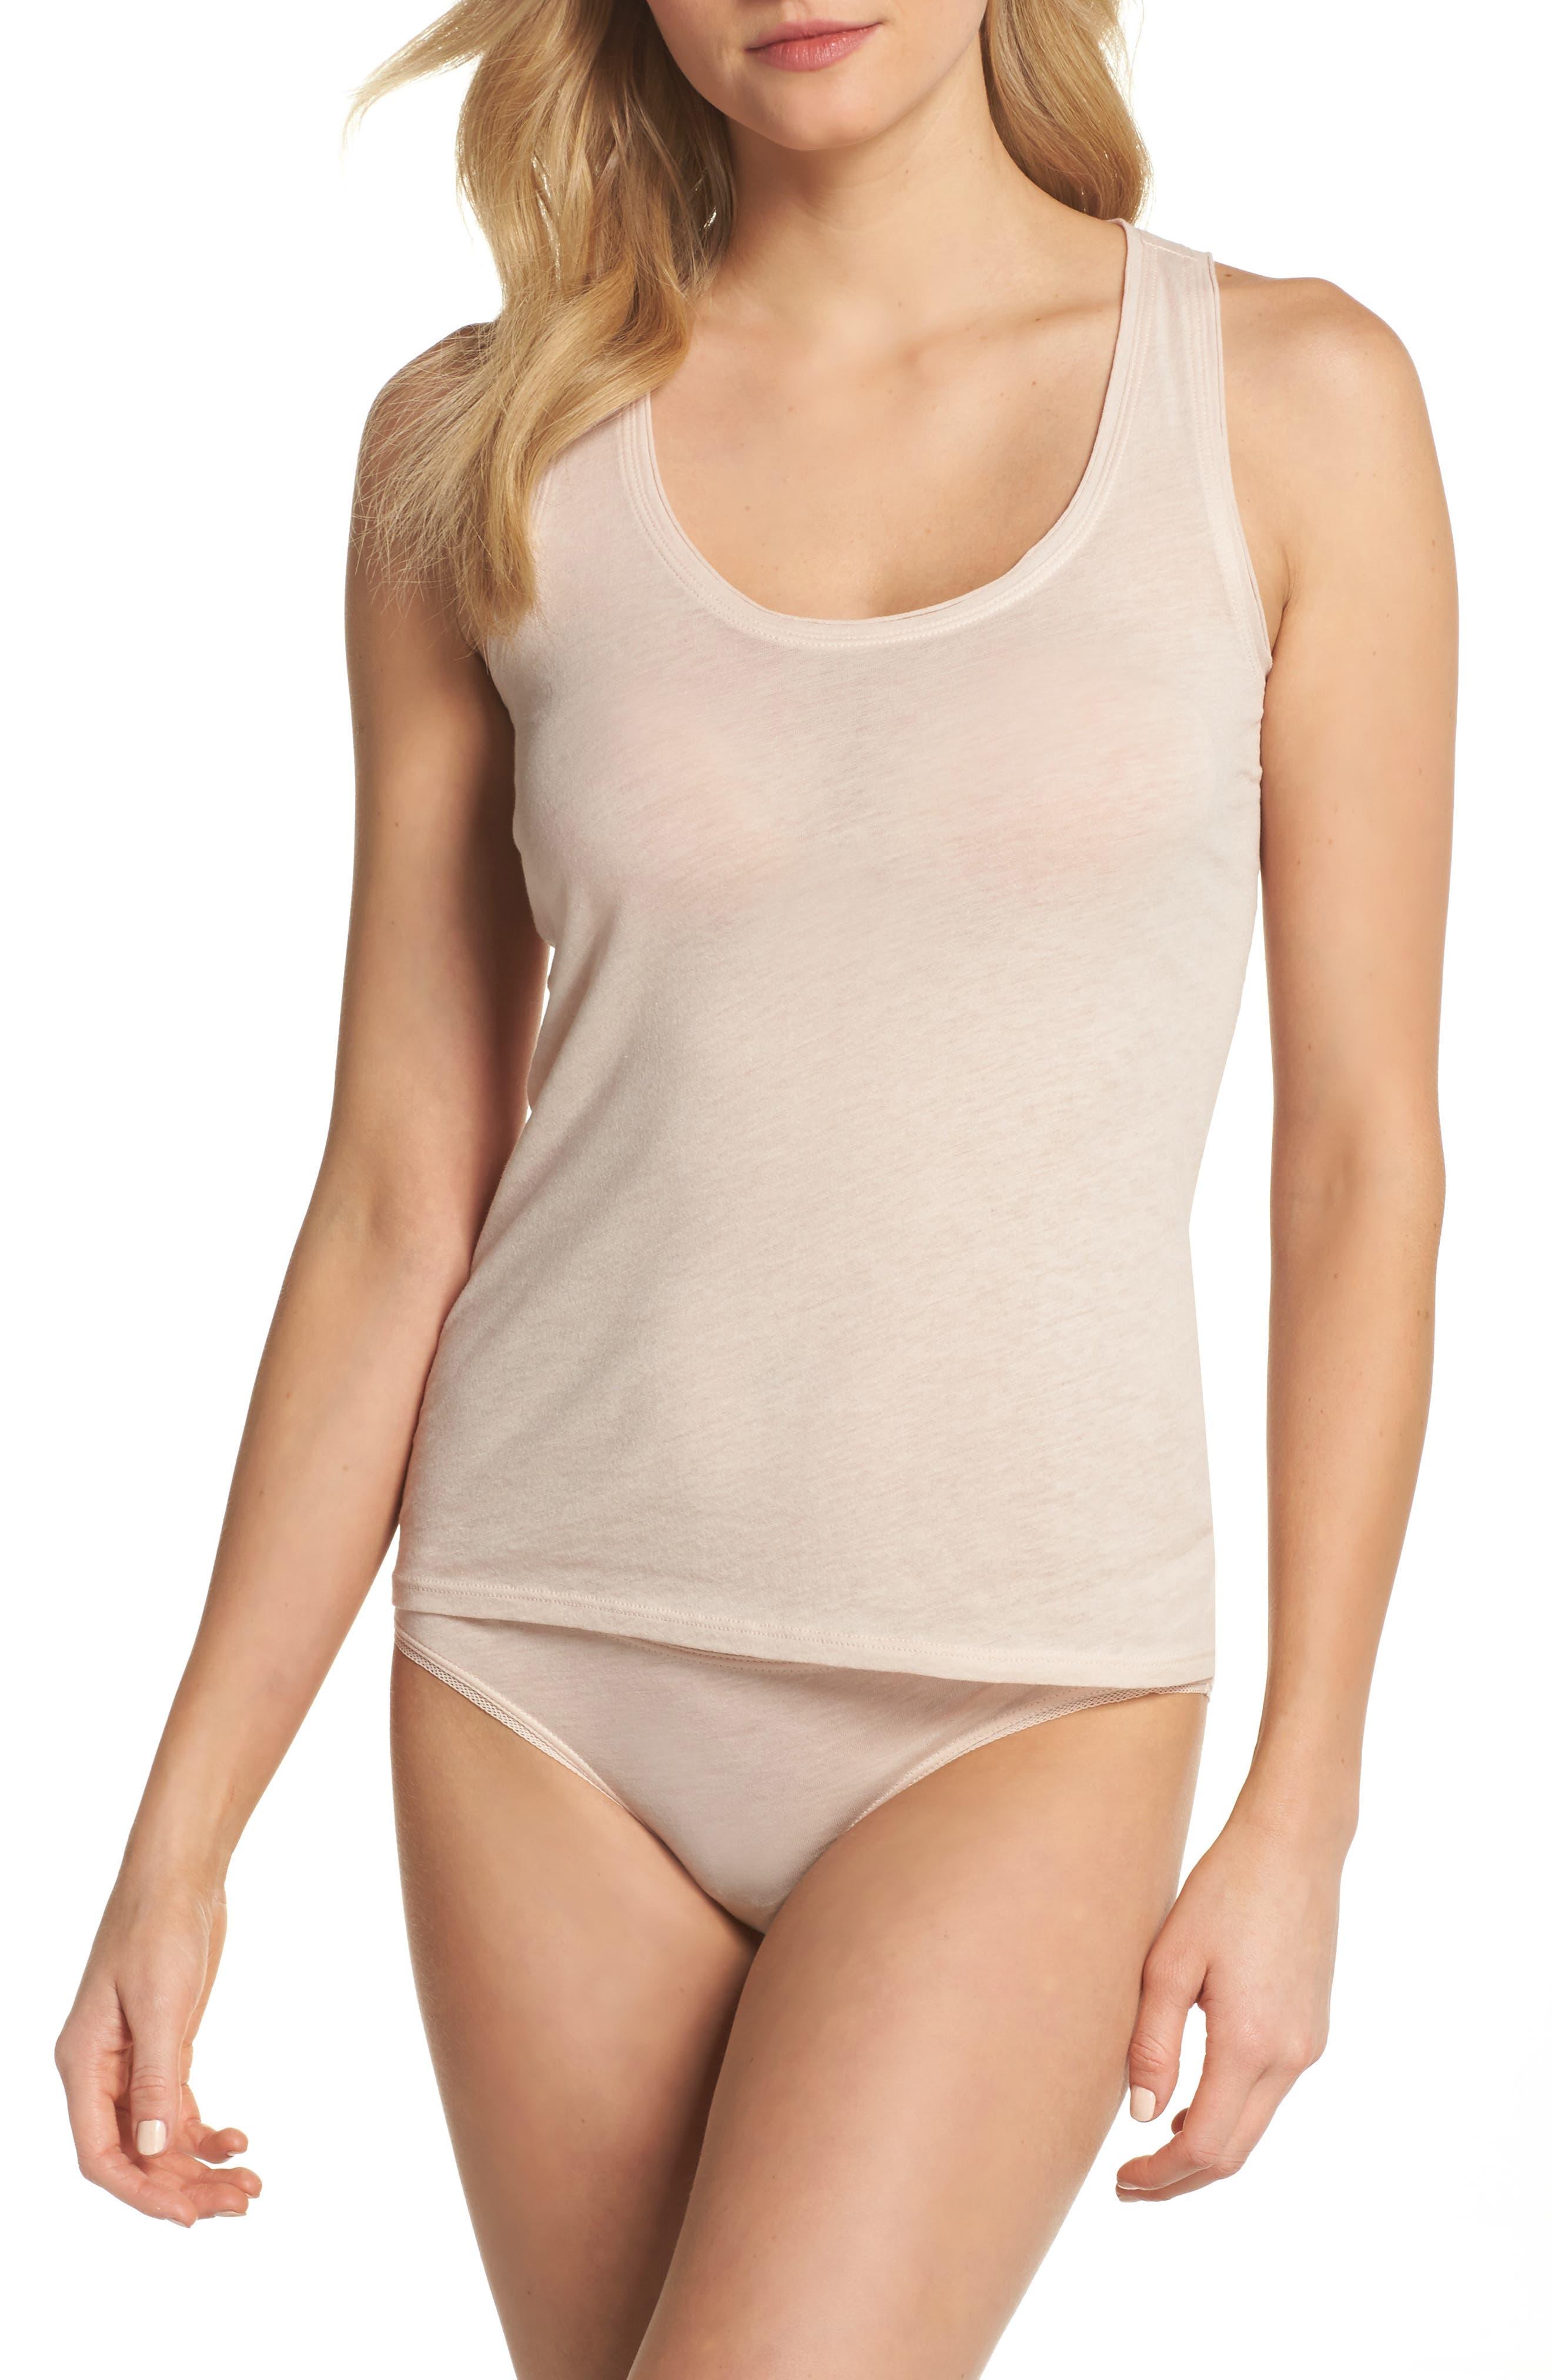 Organic Pima Cotton Bikini,                             Alternate thumbnail 5, color,                             Powder Pink